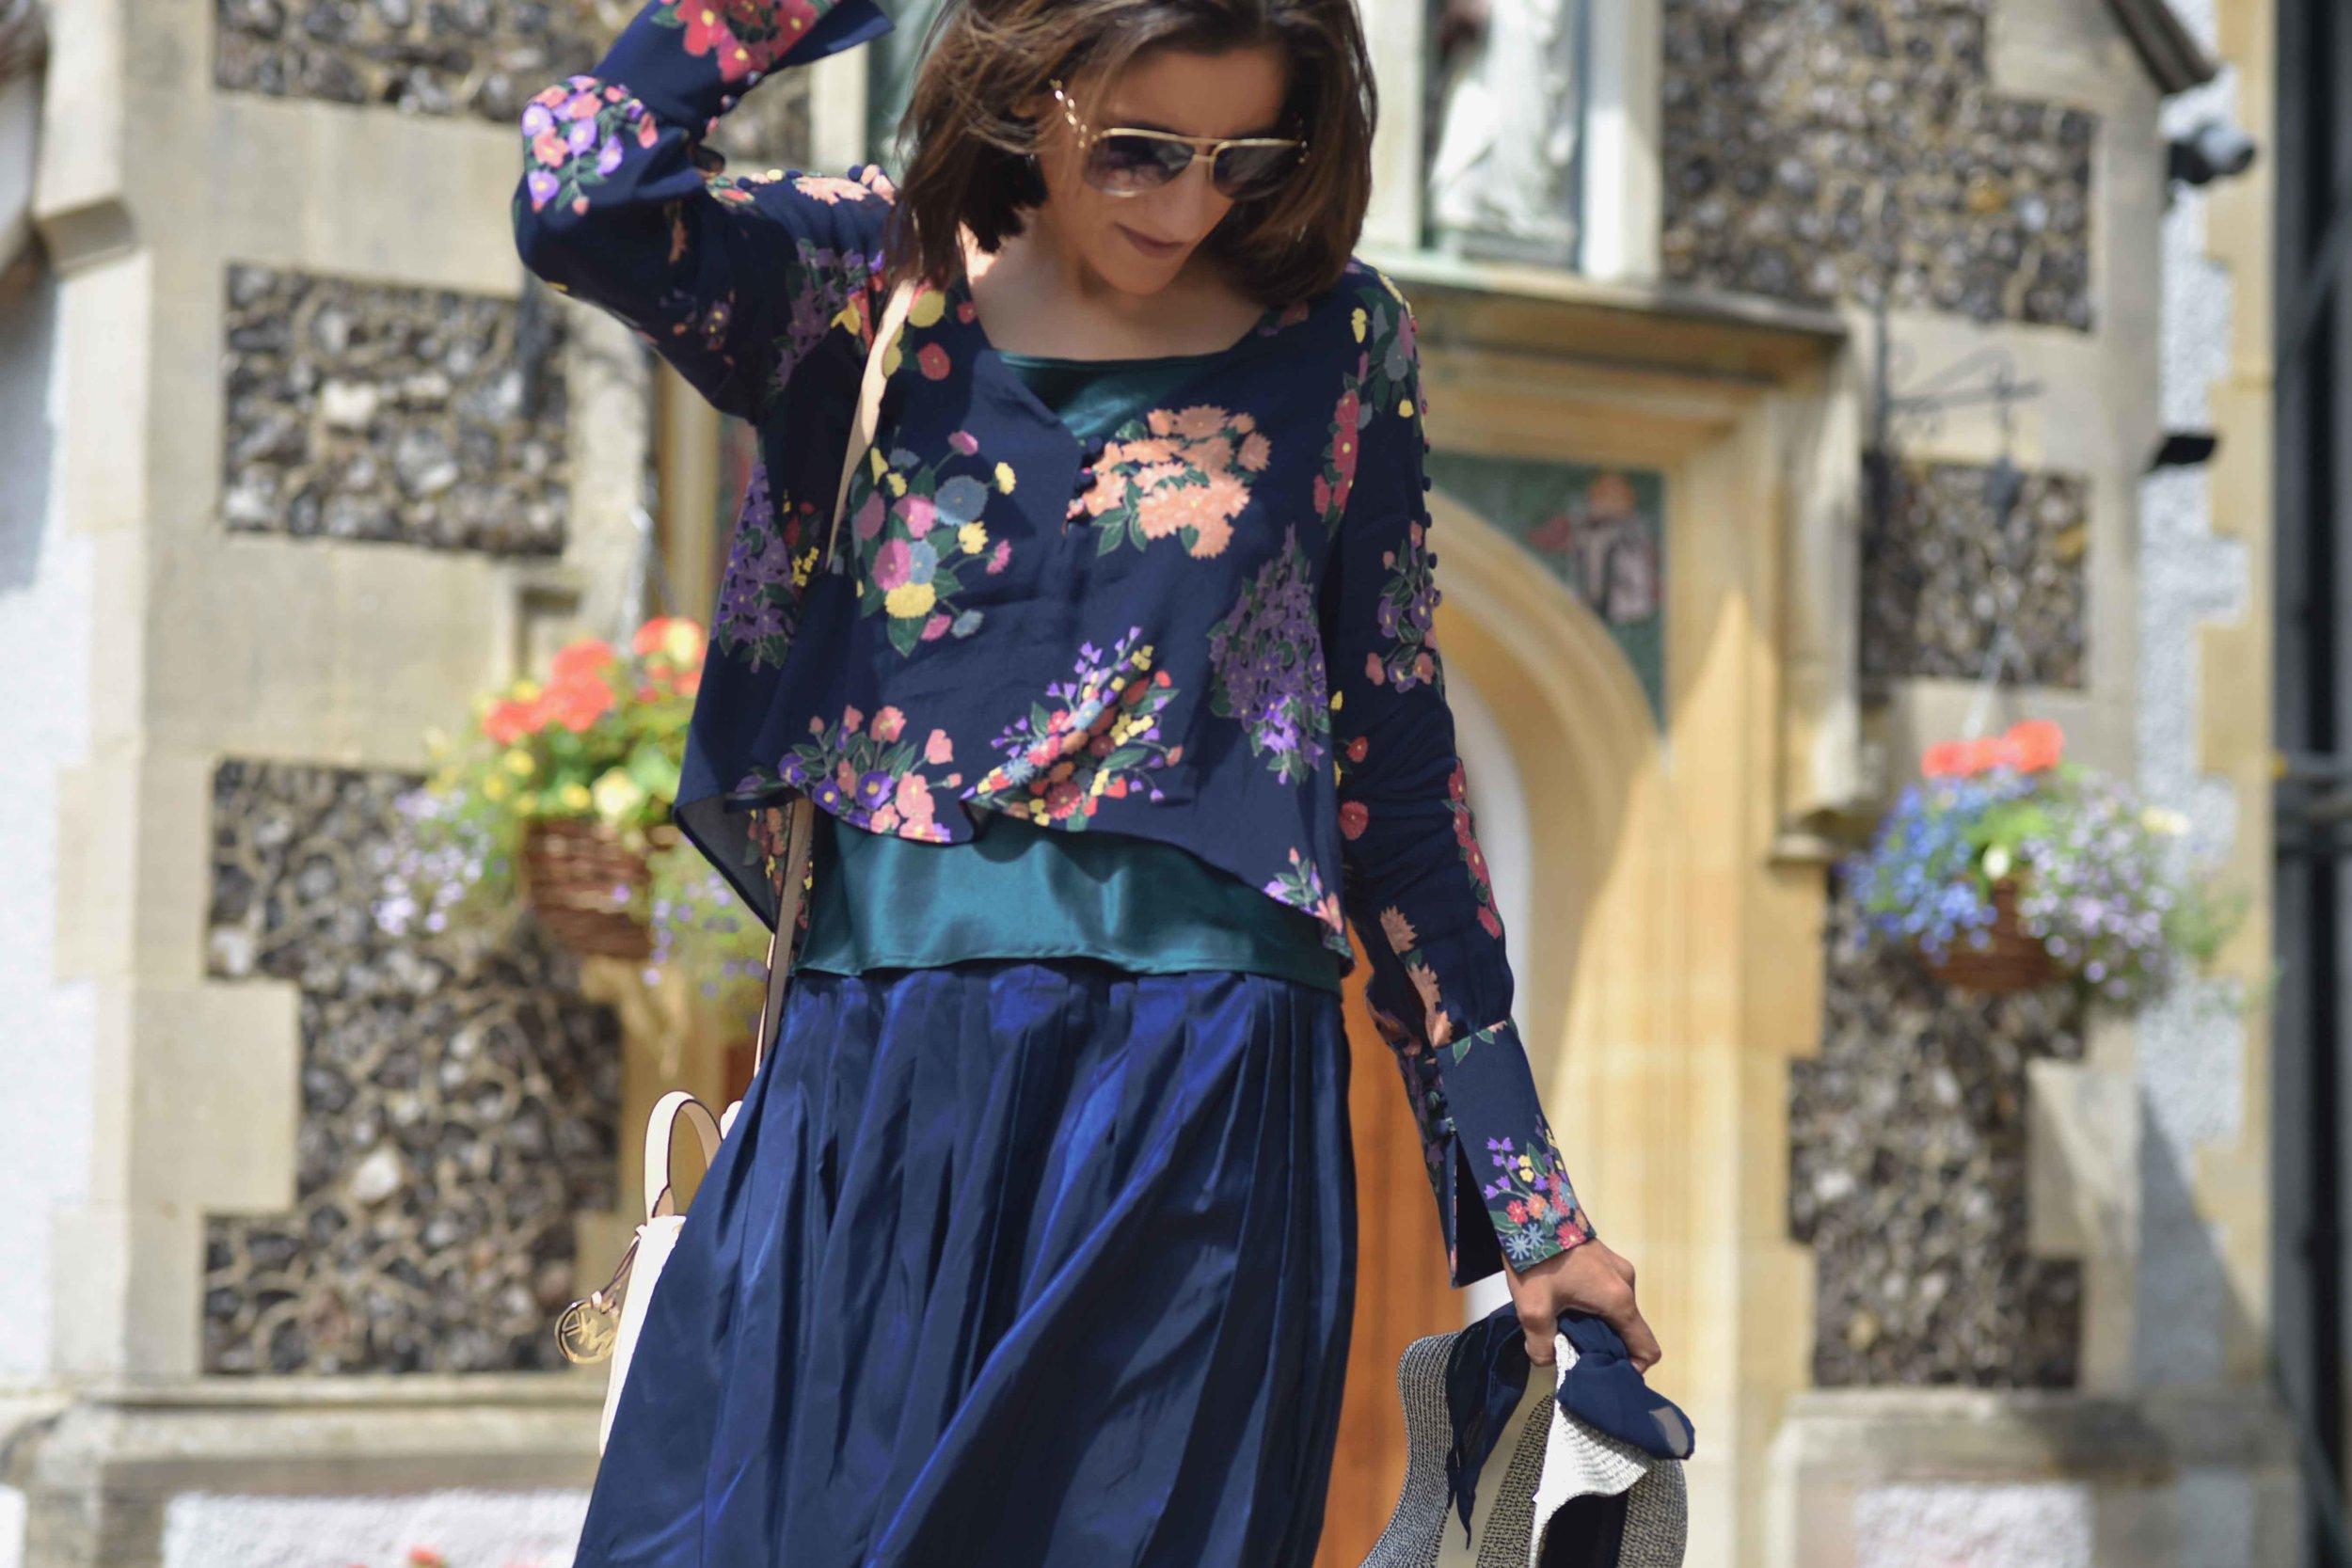 Zara floral top, Talbots silk Taffeta skirt, Talbots silk camisole, M&S hat. Image©sourcingstyle.com